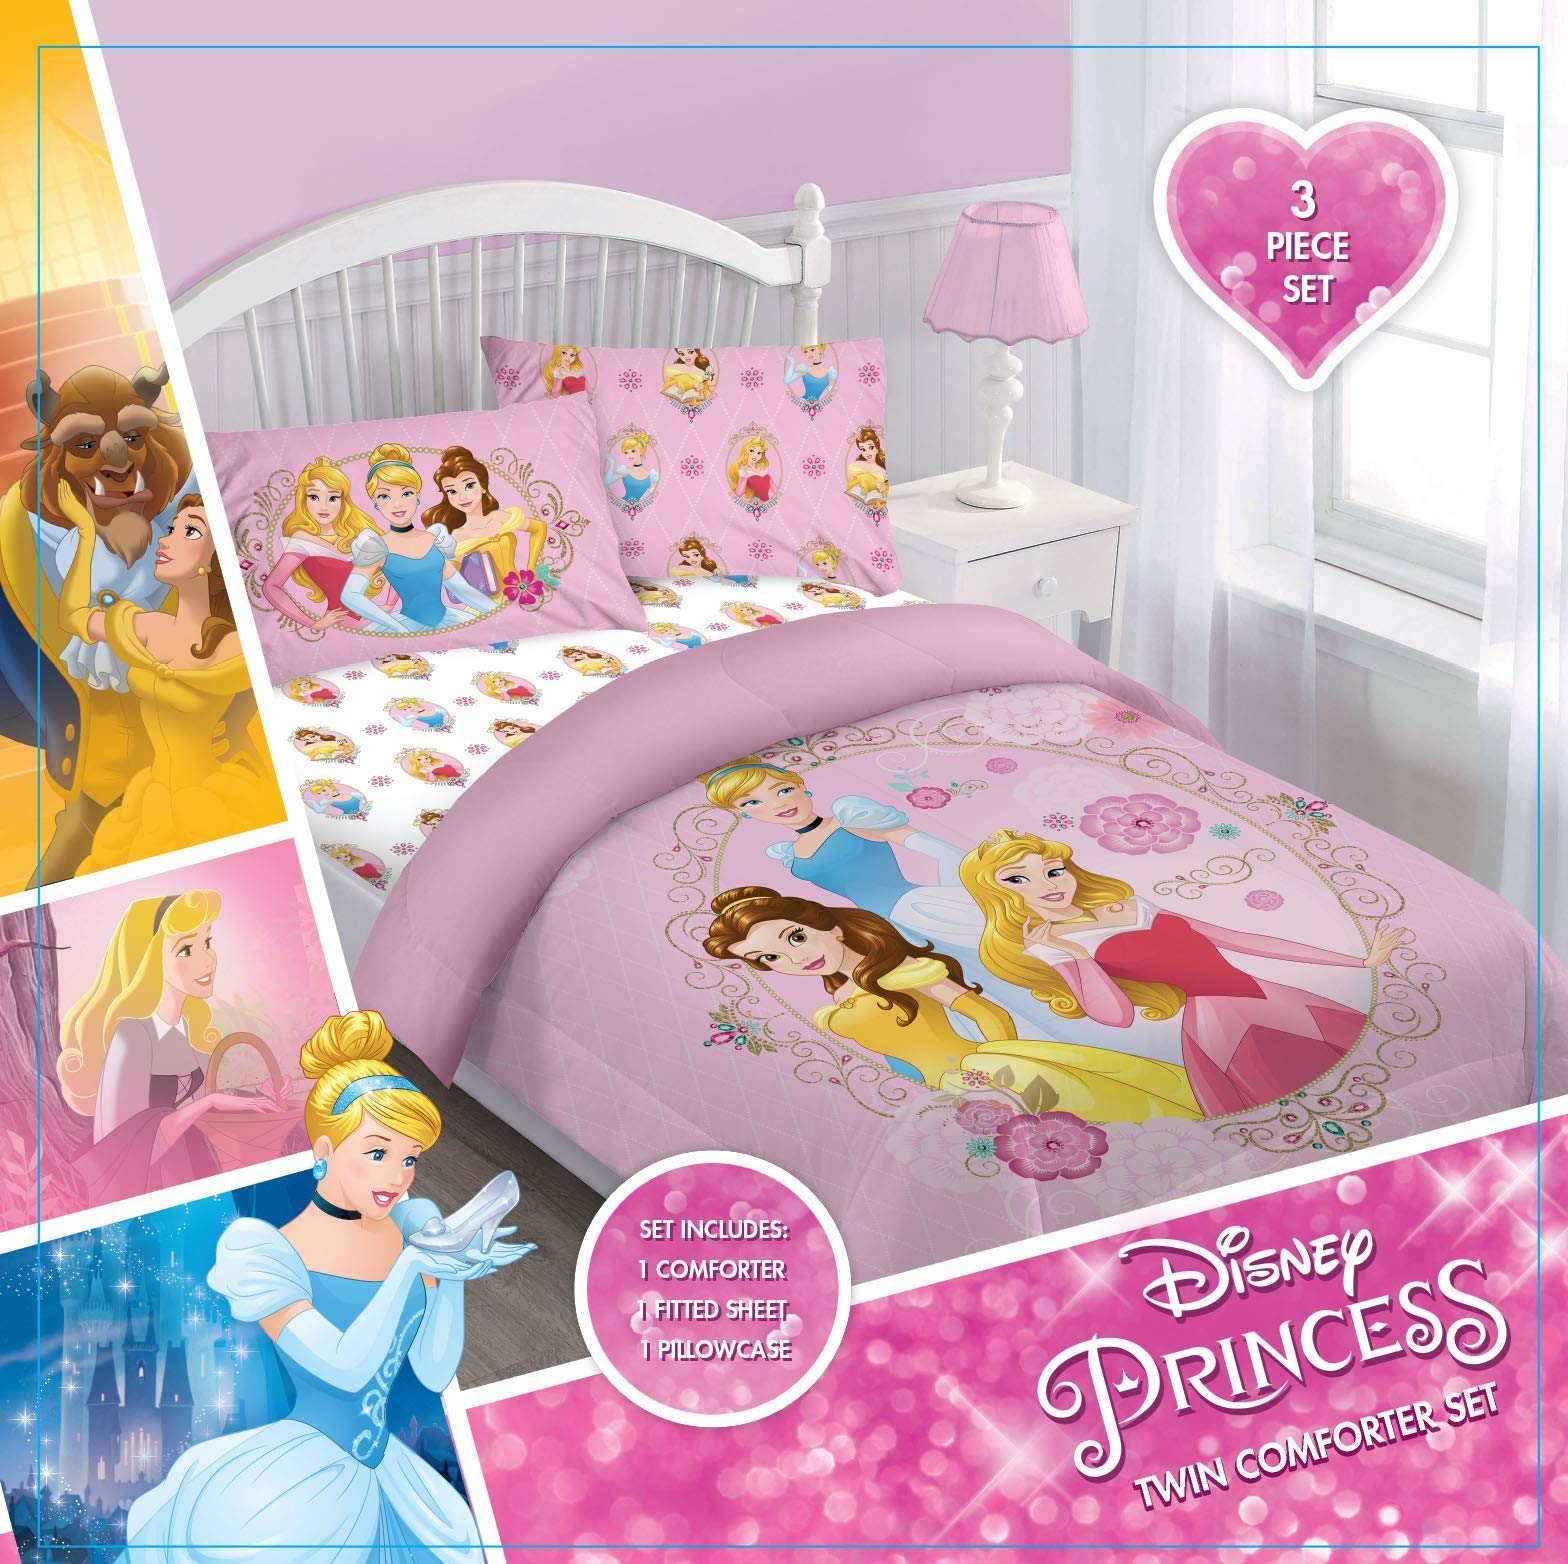 Comforter Set - Disney Princess Courage Twin